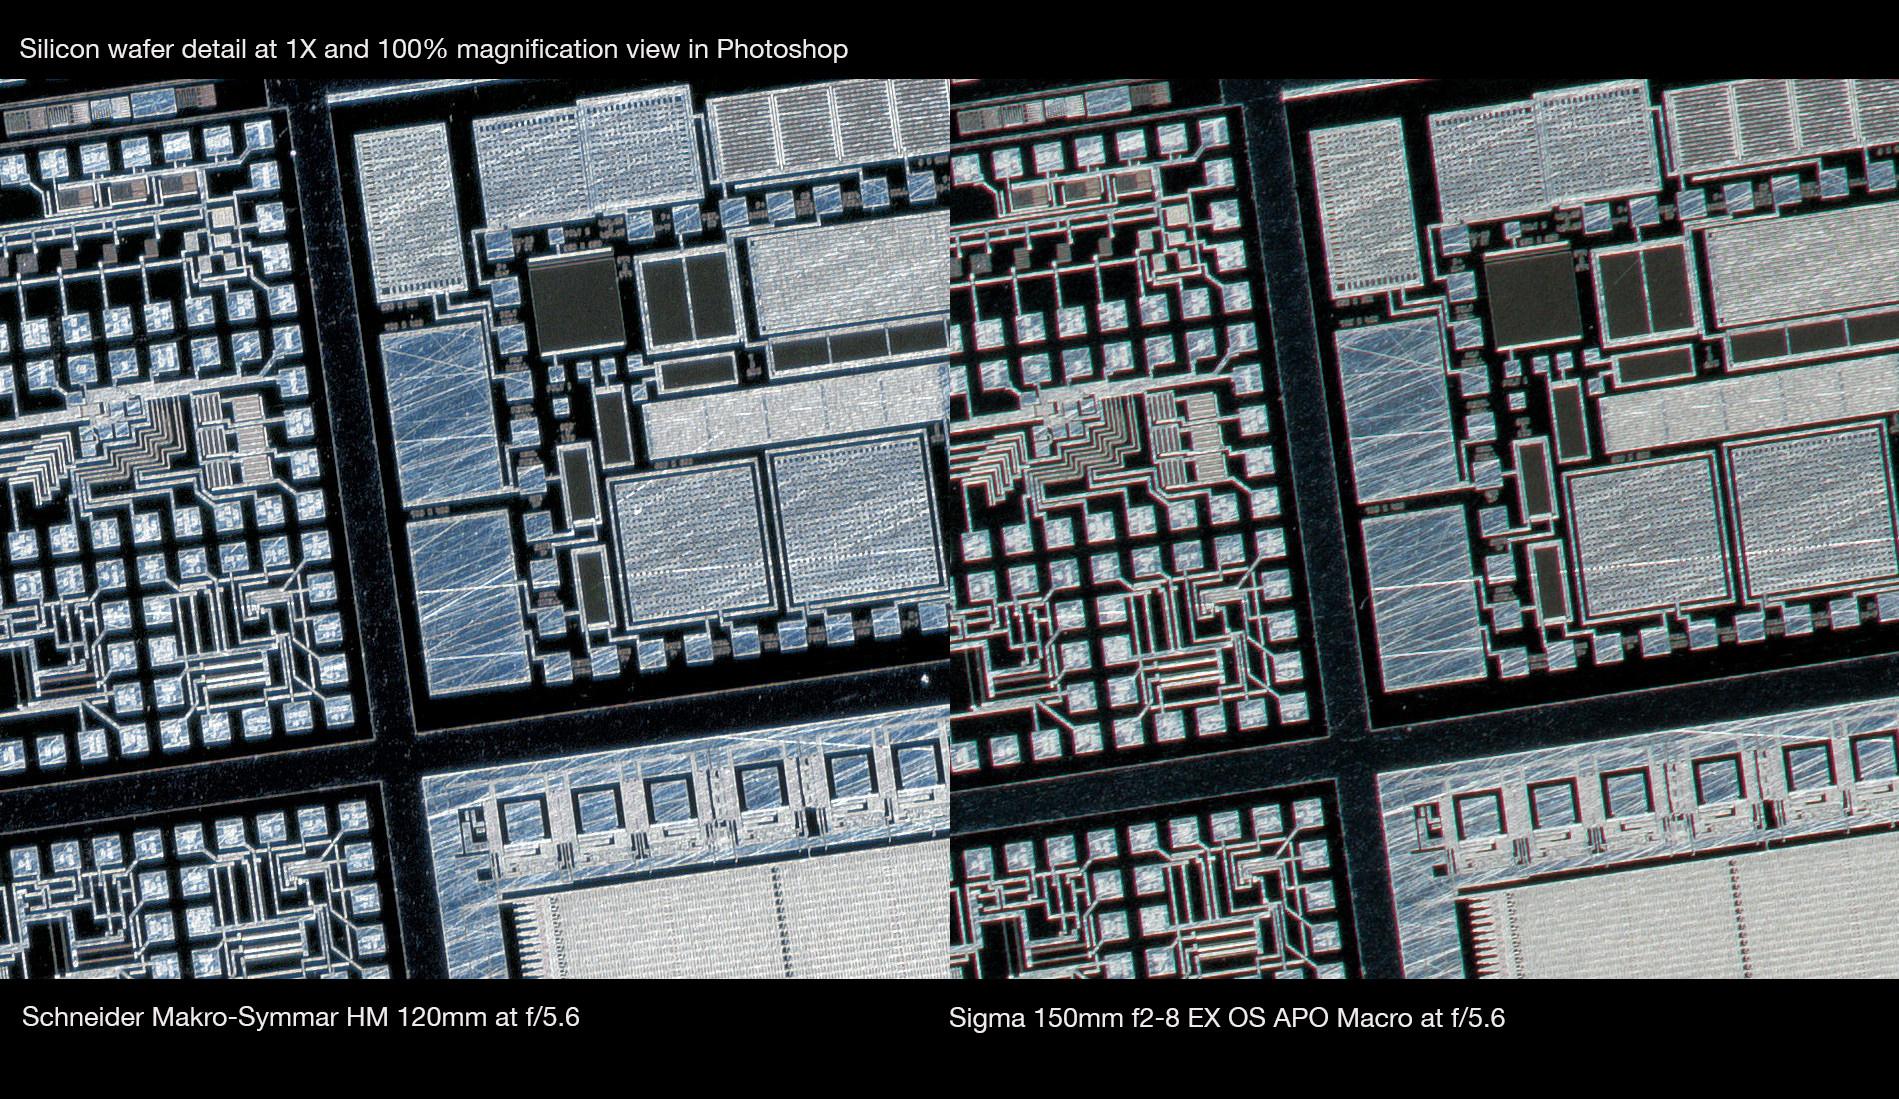 Schneider-Macro-Symmar-HM-120mm-vs-Sigma-150-Macro-at-1X-corner-crop-Robert-OToole-Photography.JPG